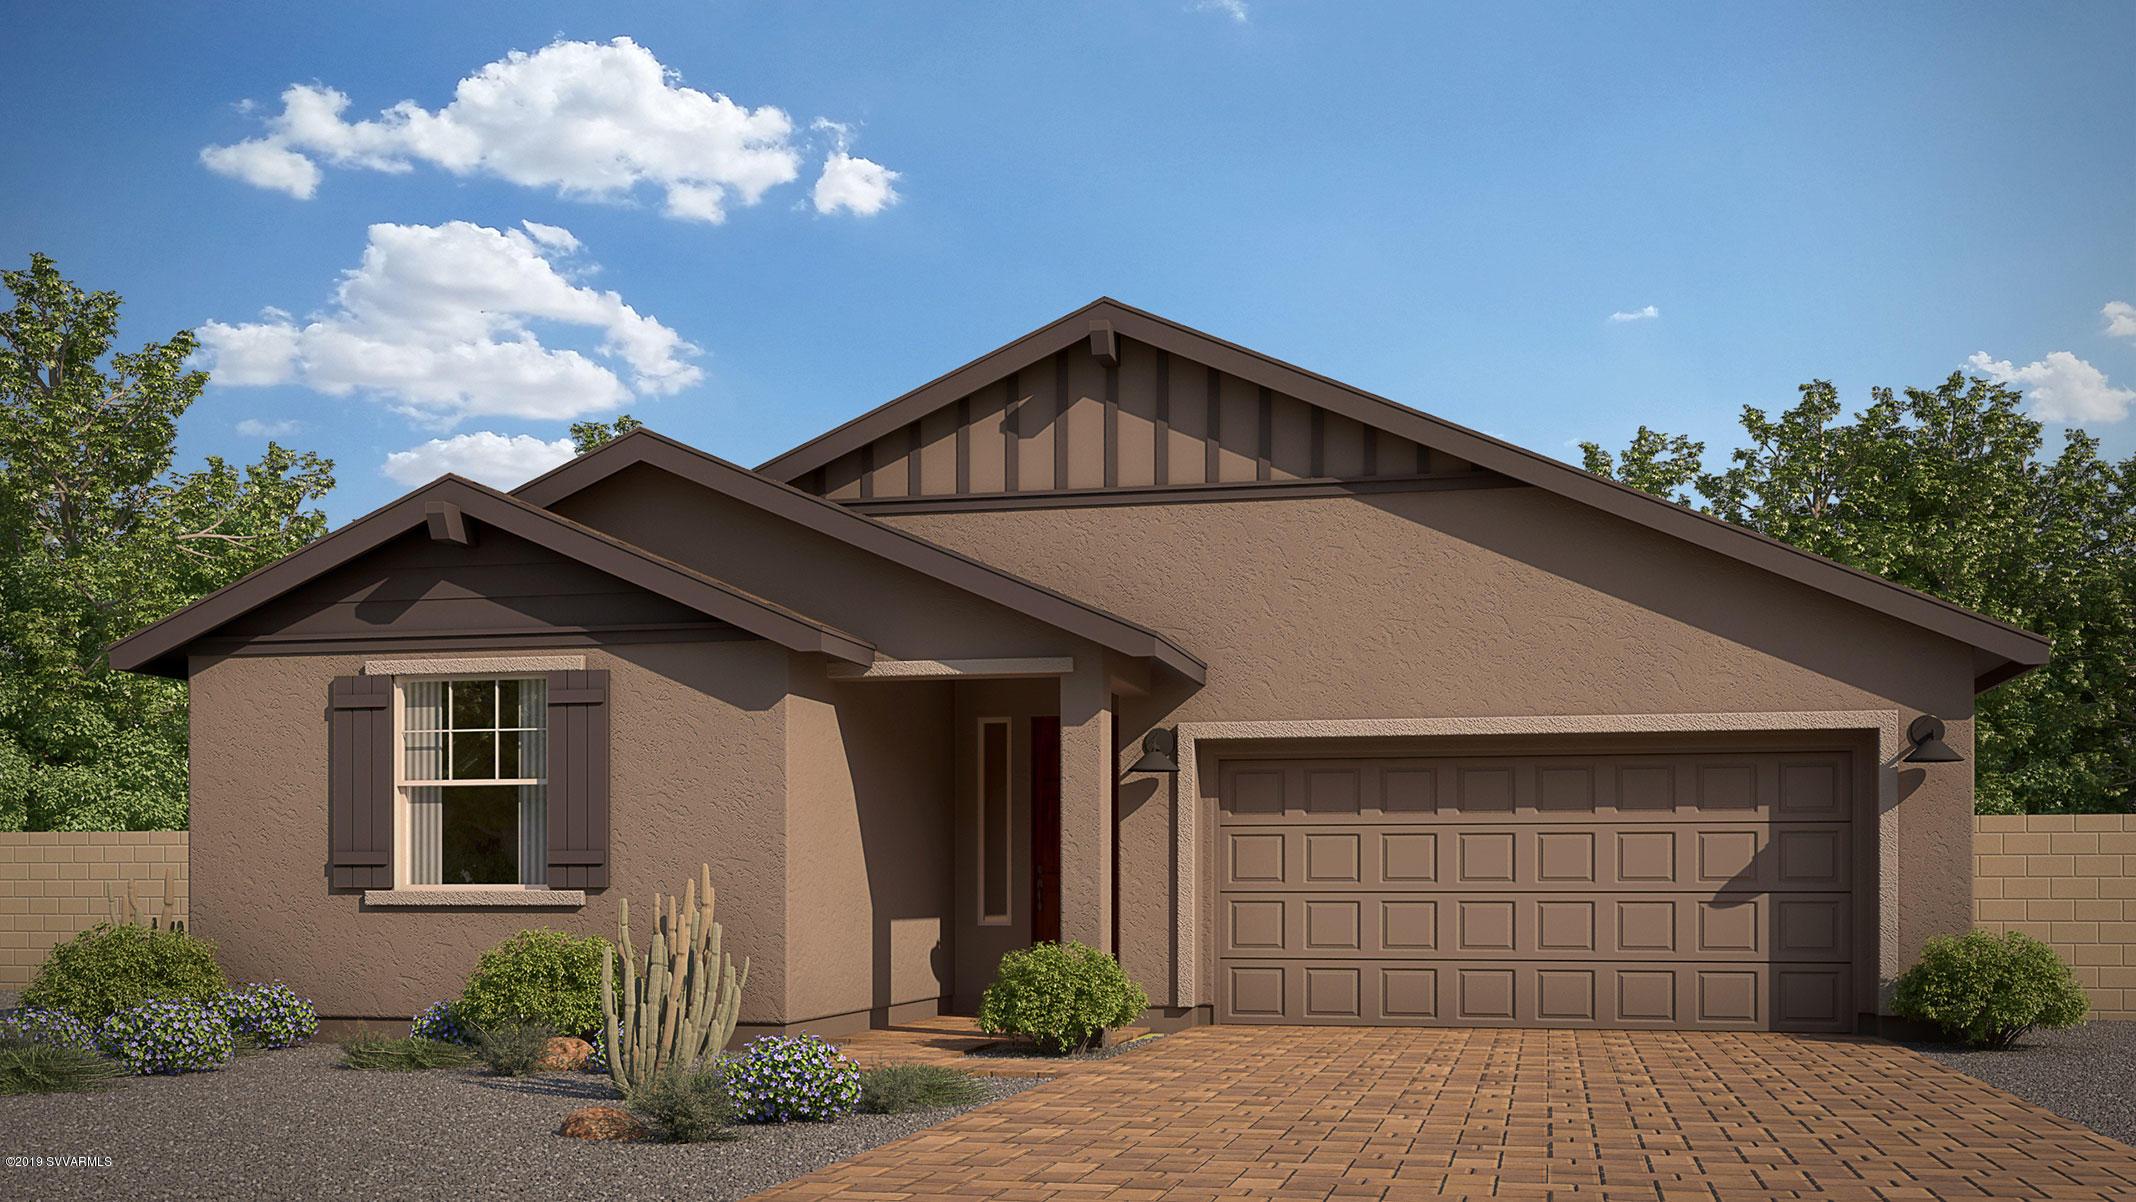 509 Hudgens Lane Clarkdale, AZ 86324